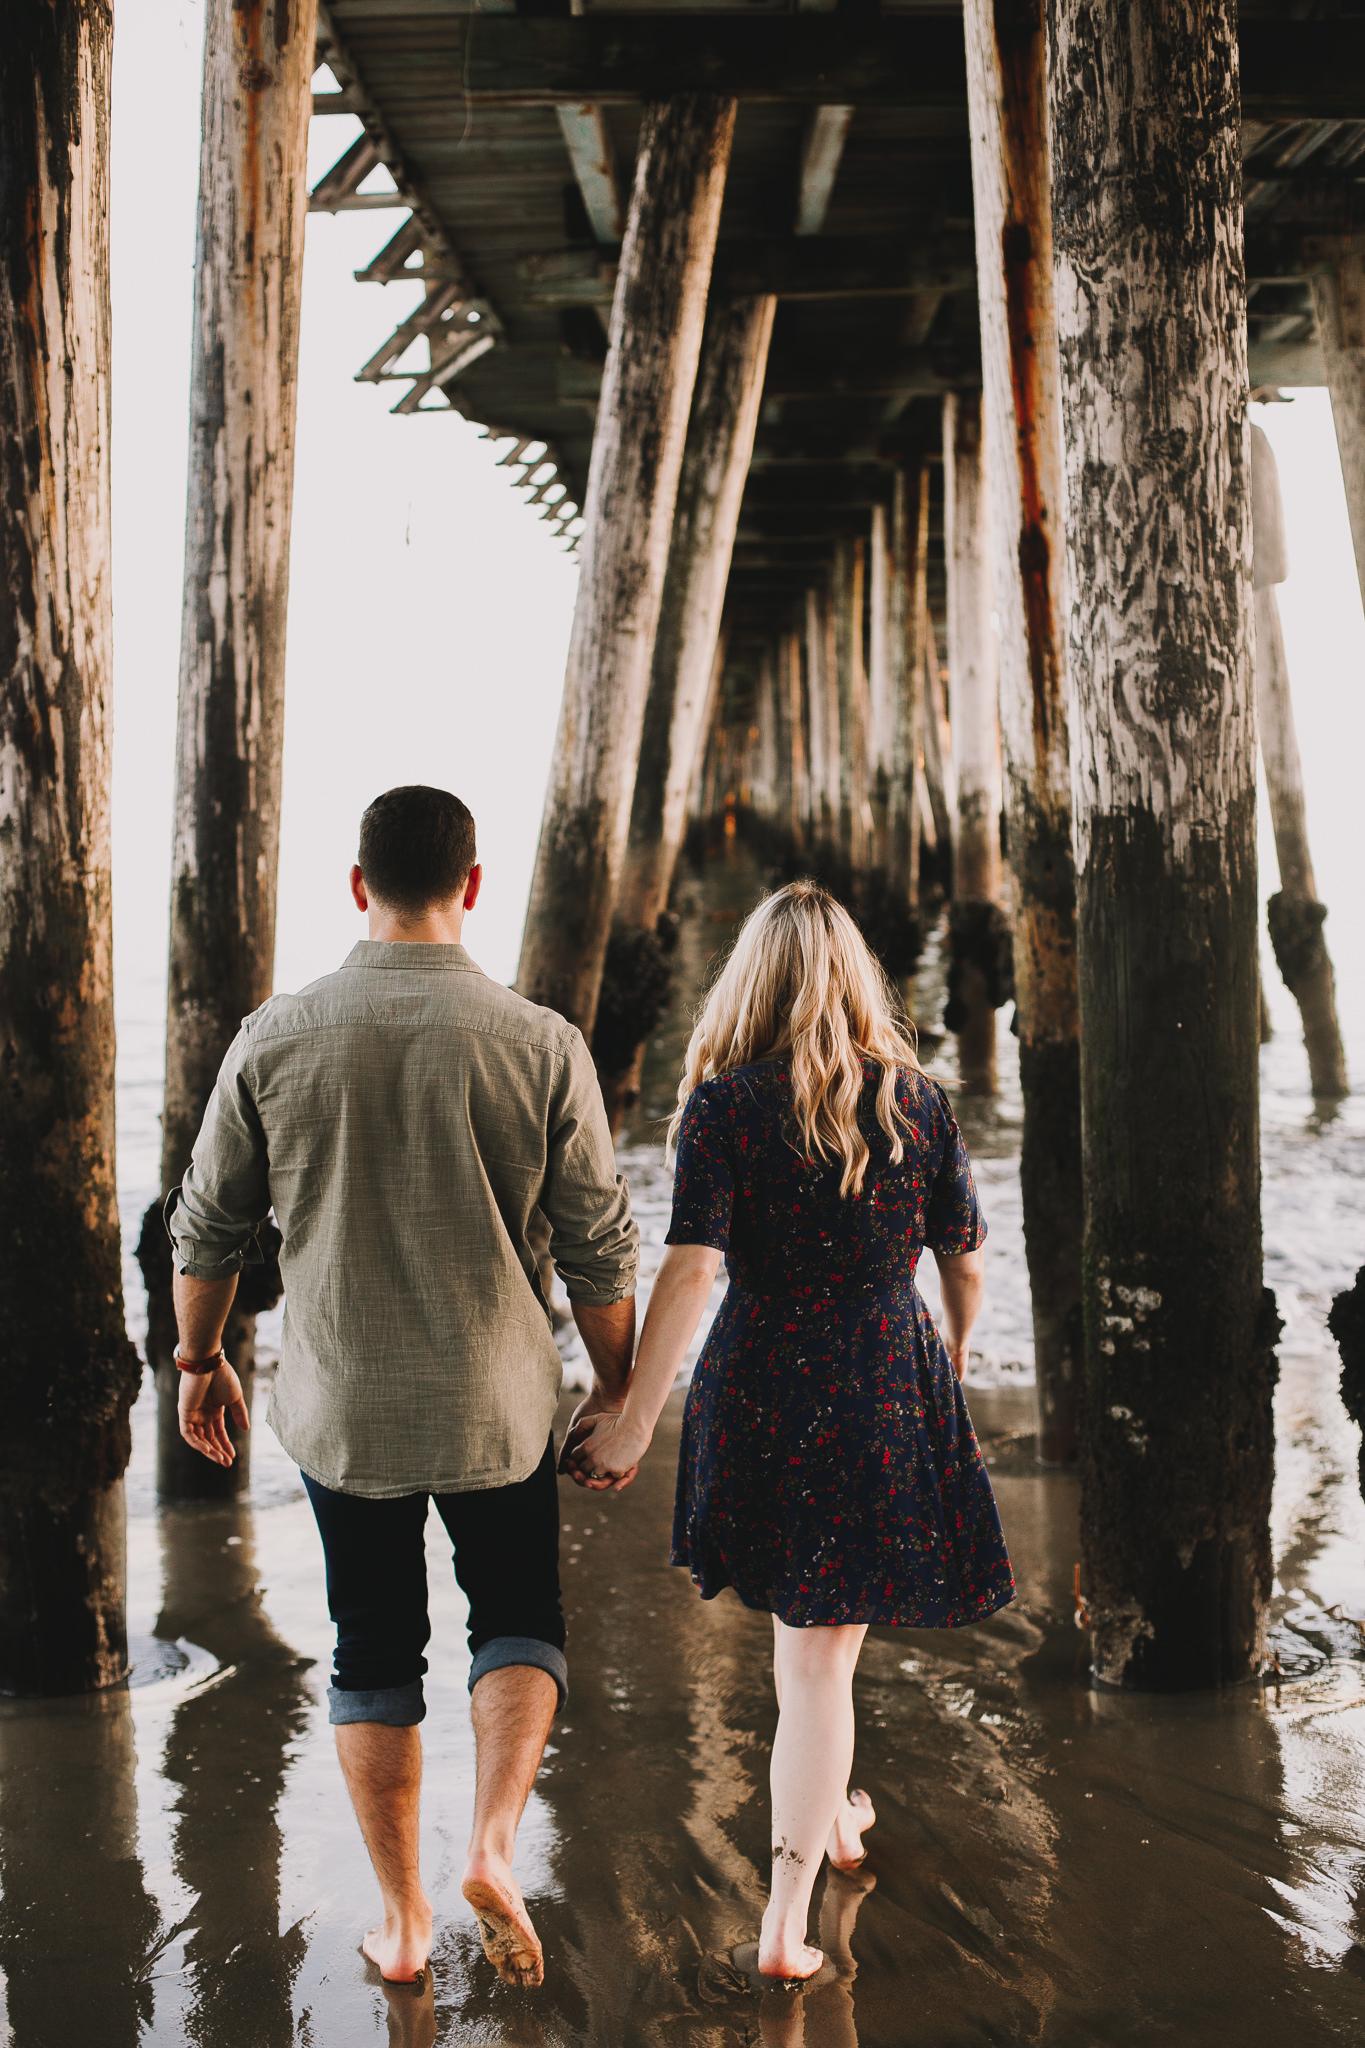 Archer Inspired Photography Capitola Beach Santa Cruz Wedding Engagement Lifestyle Session Photographer-124.jpg